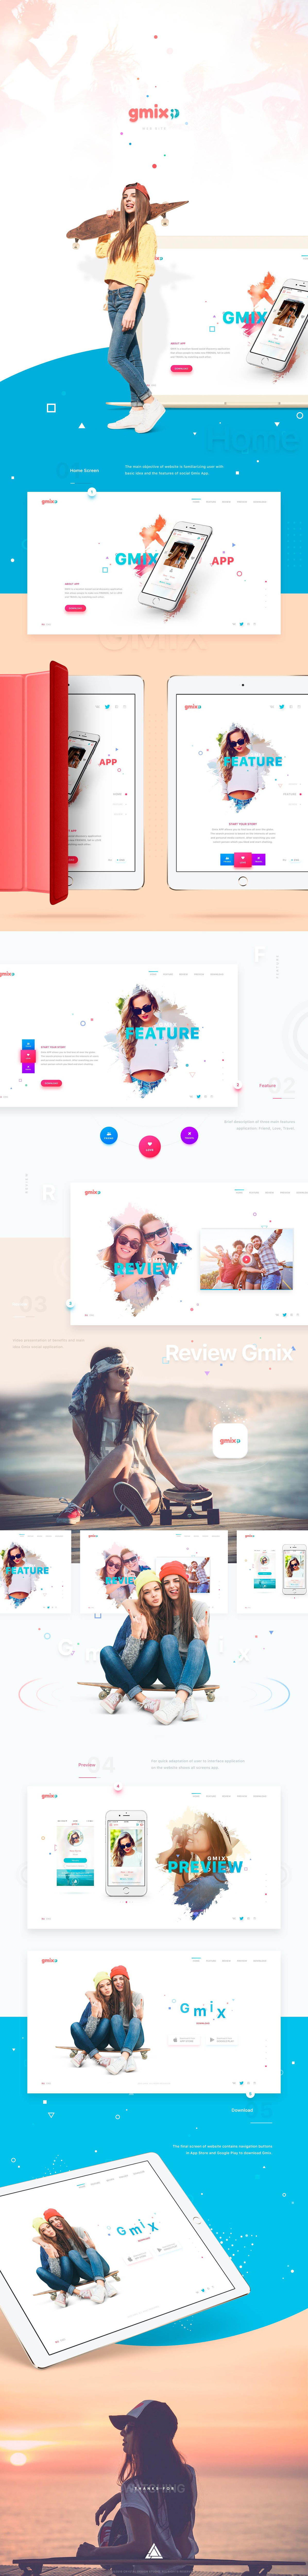 gmix web site on behance